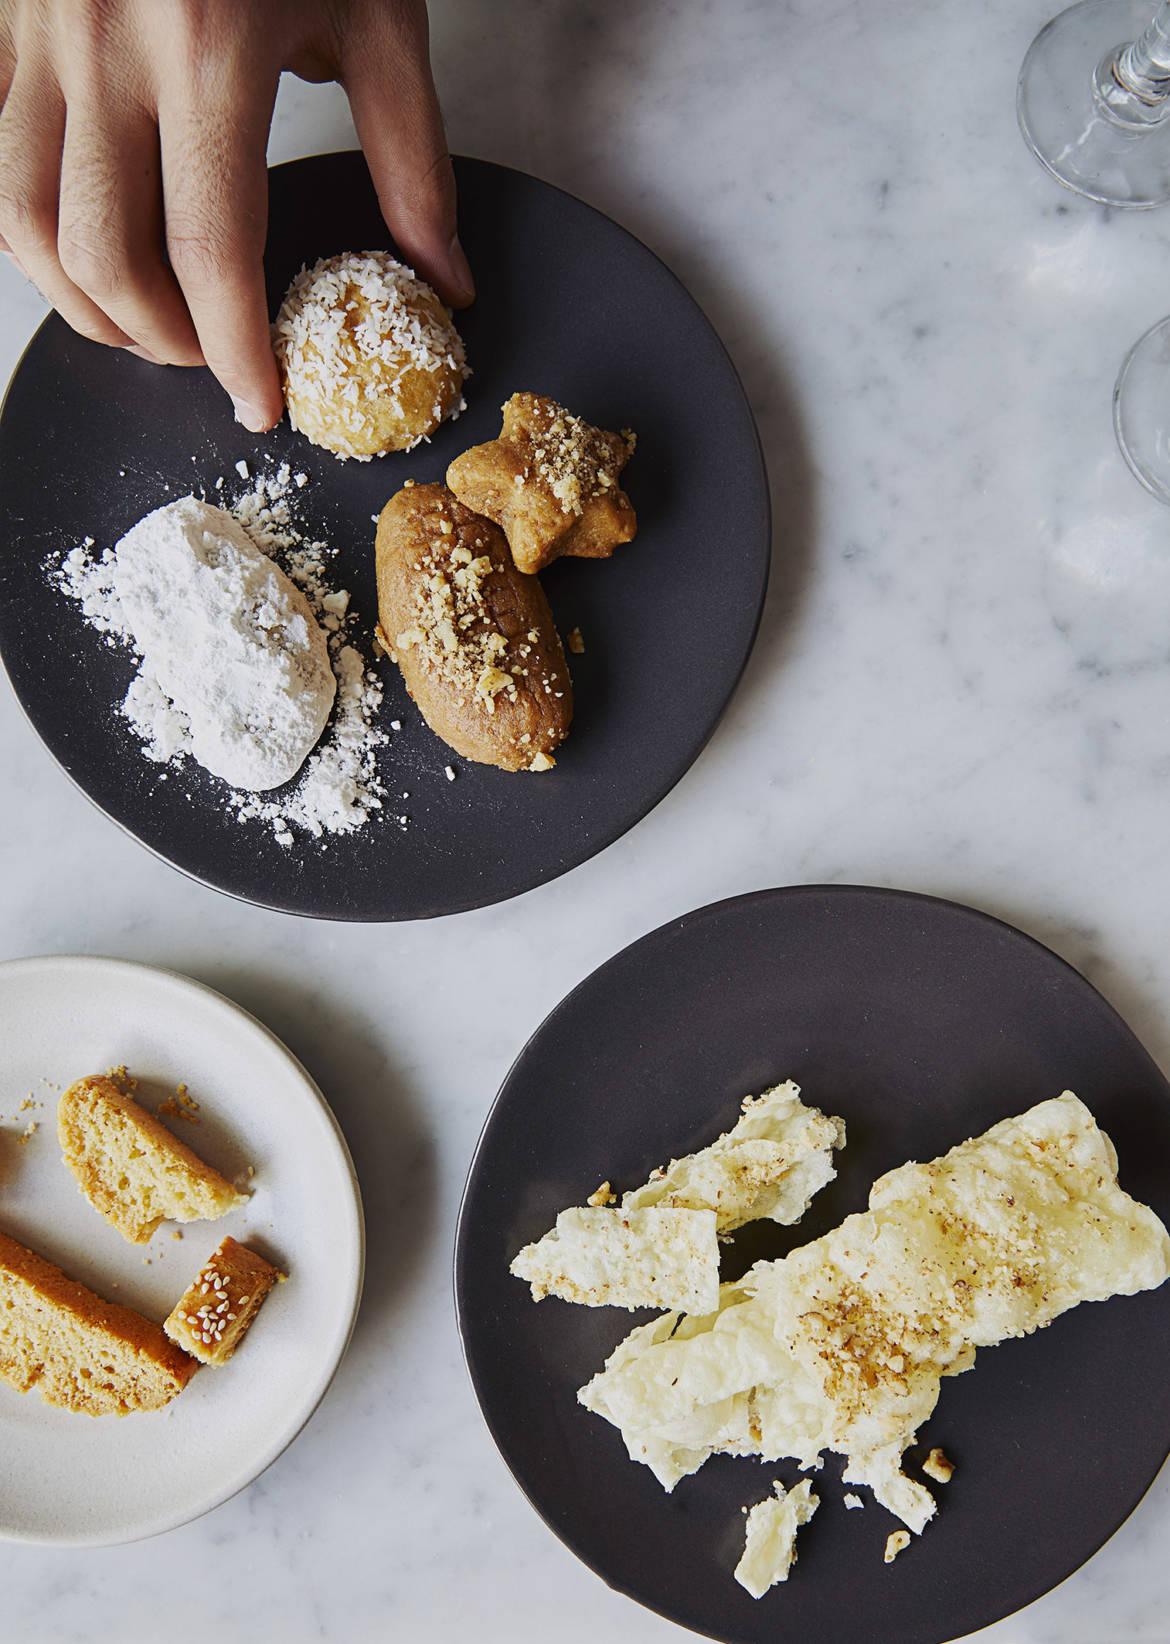 Li_Sylvie_Kamenitsa_pastries.jpg